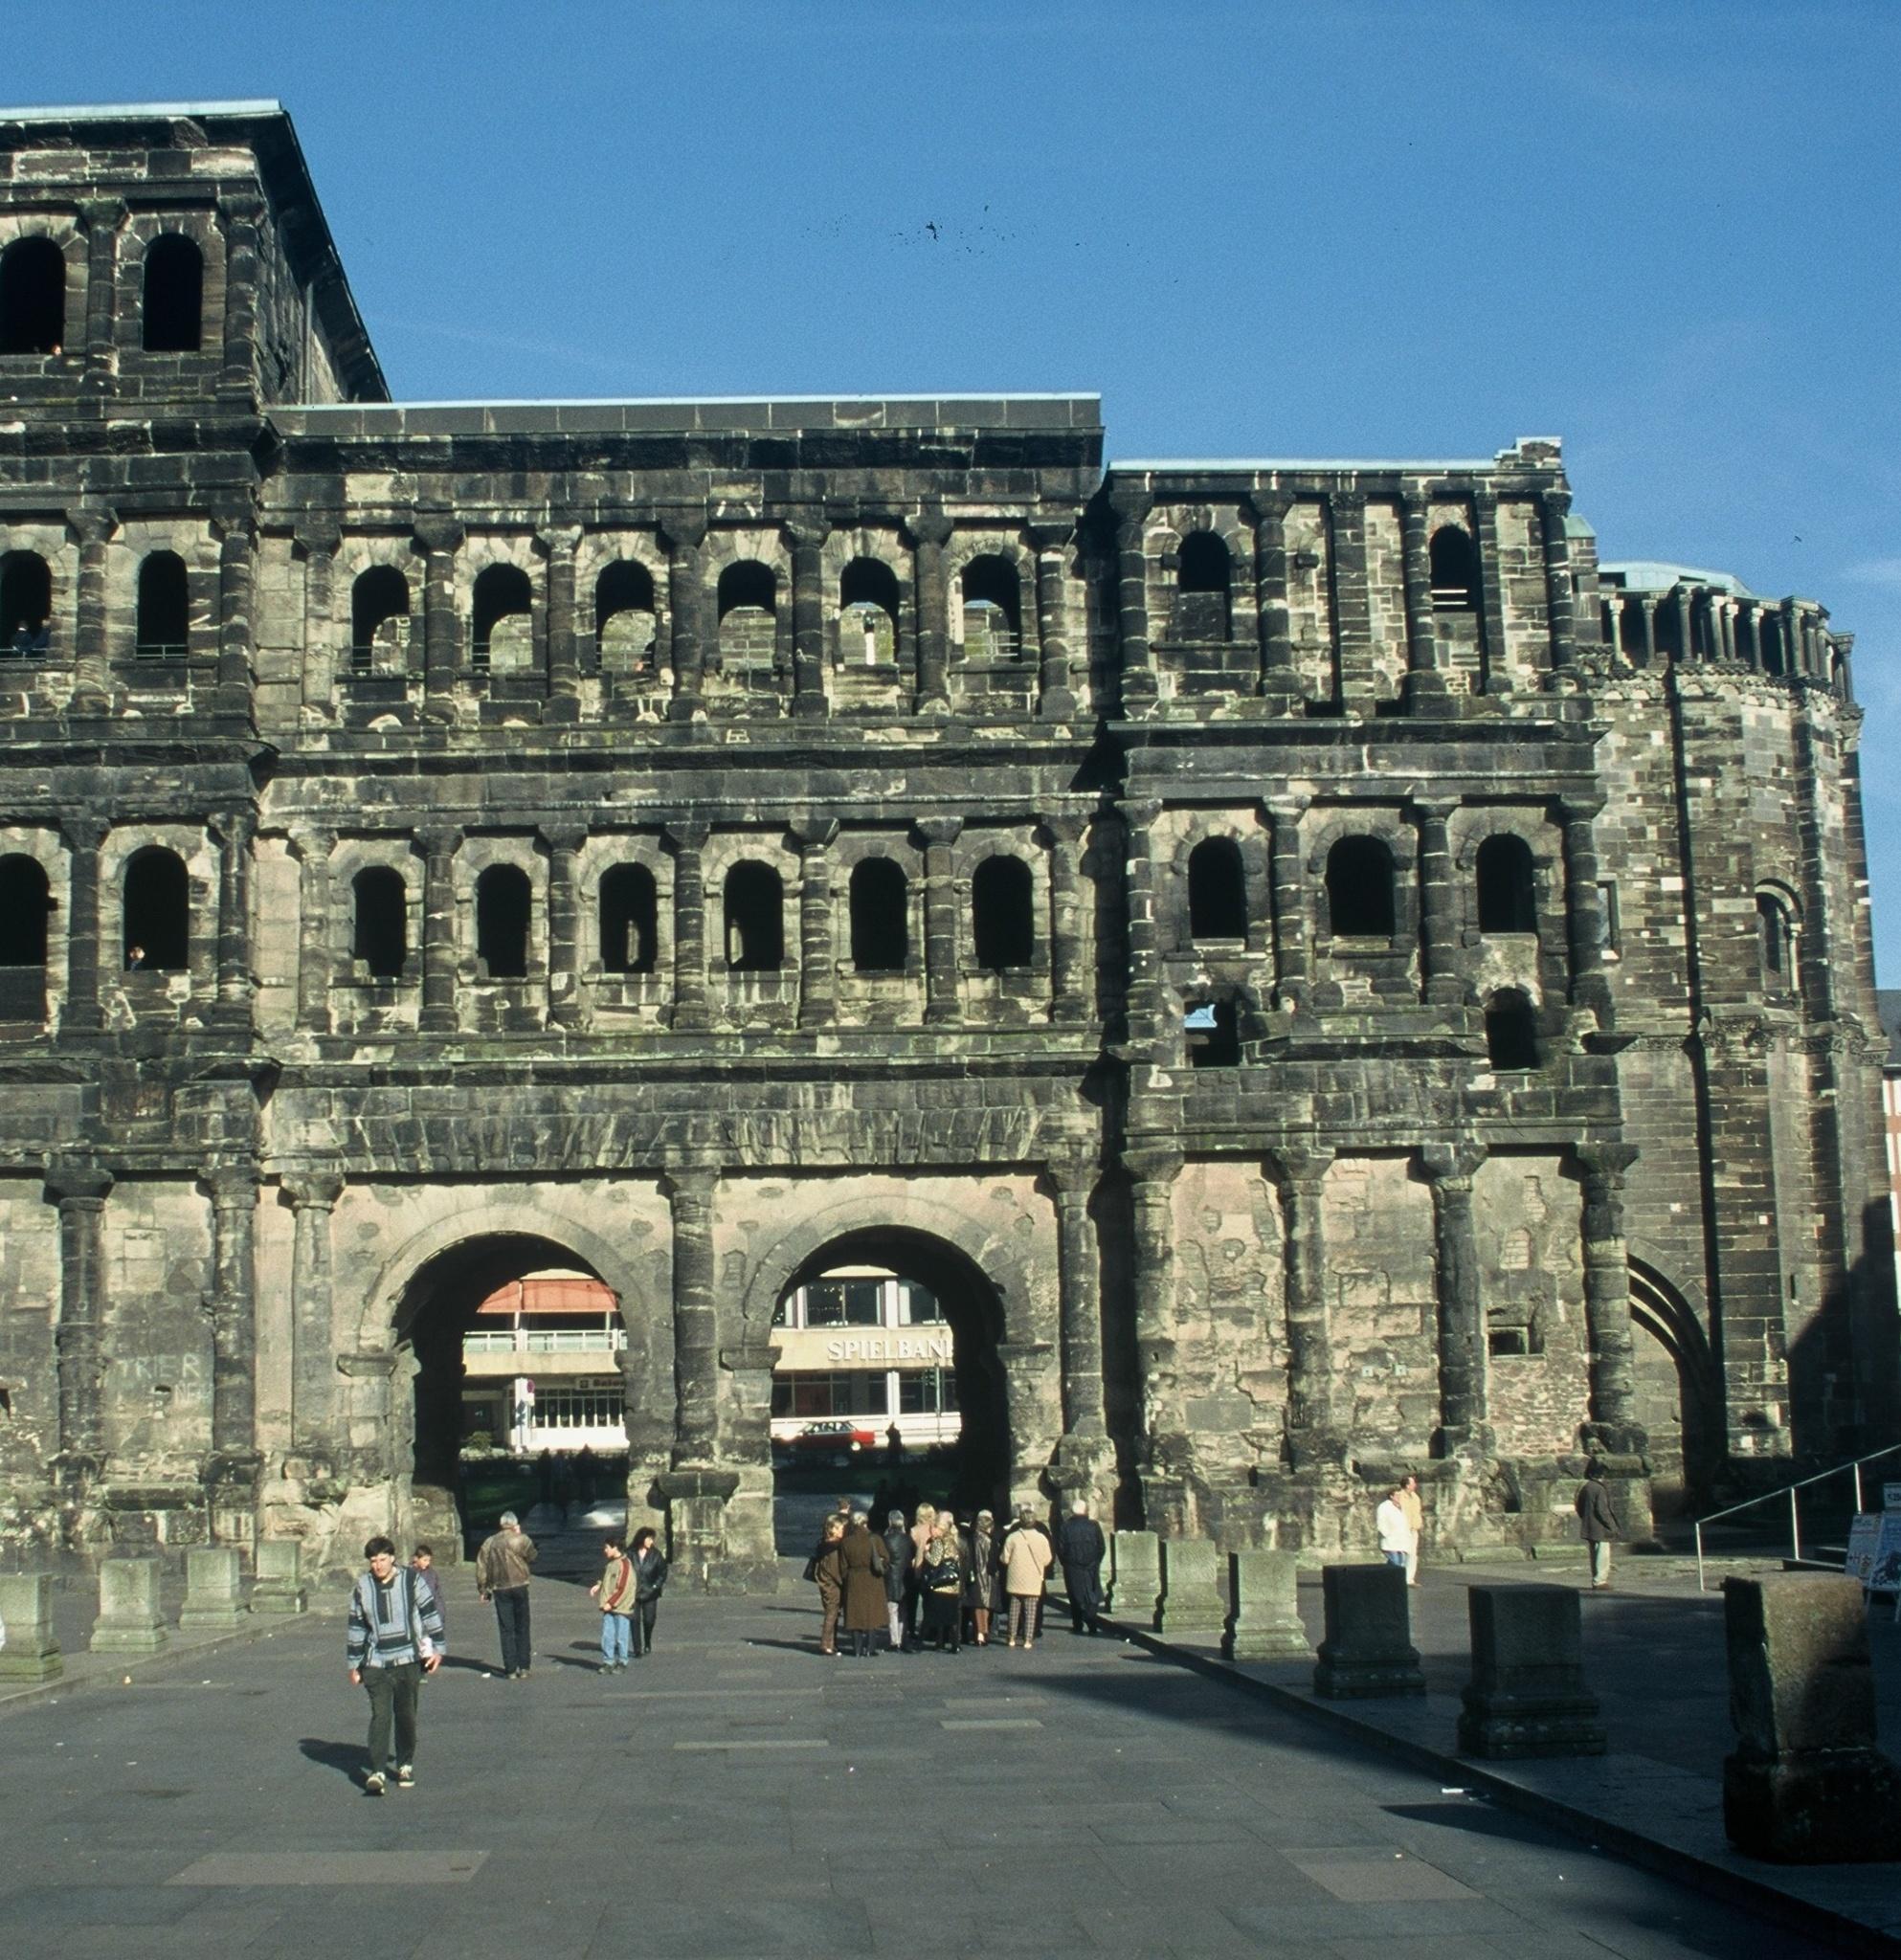 Ausoniusweg 06. Etappe: Fell Trier • Wanderung